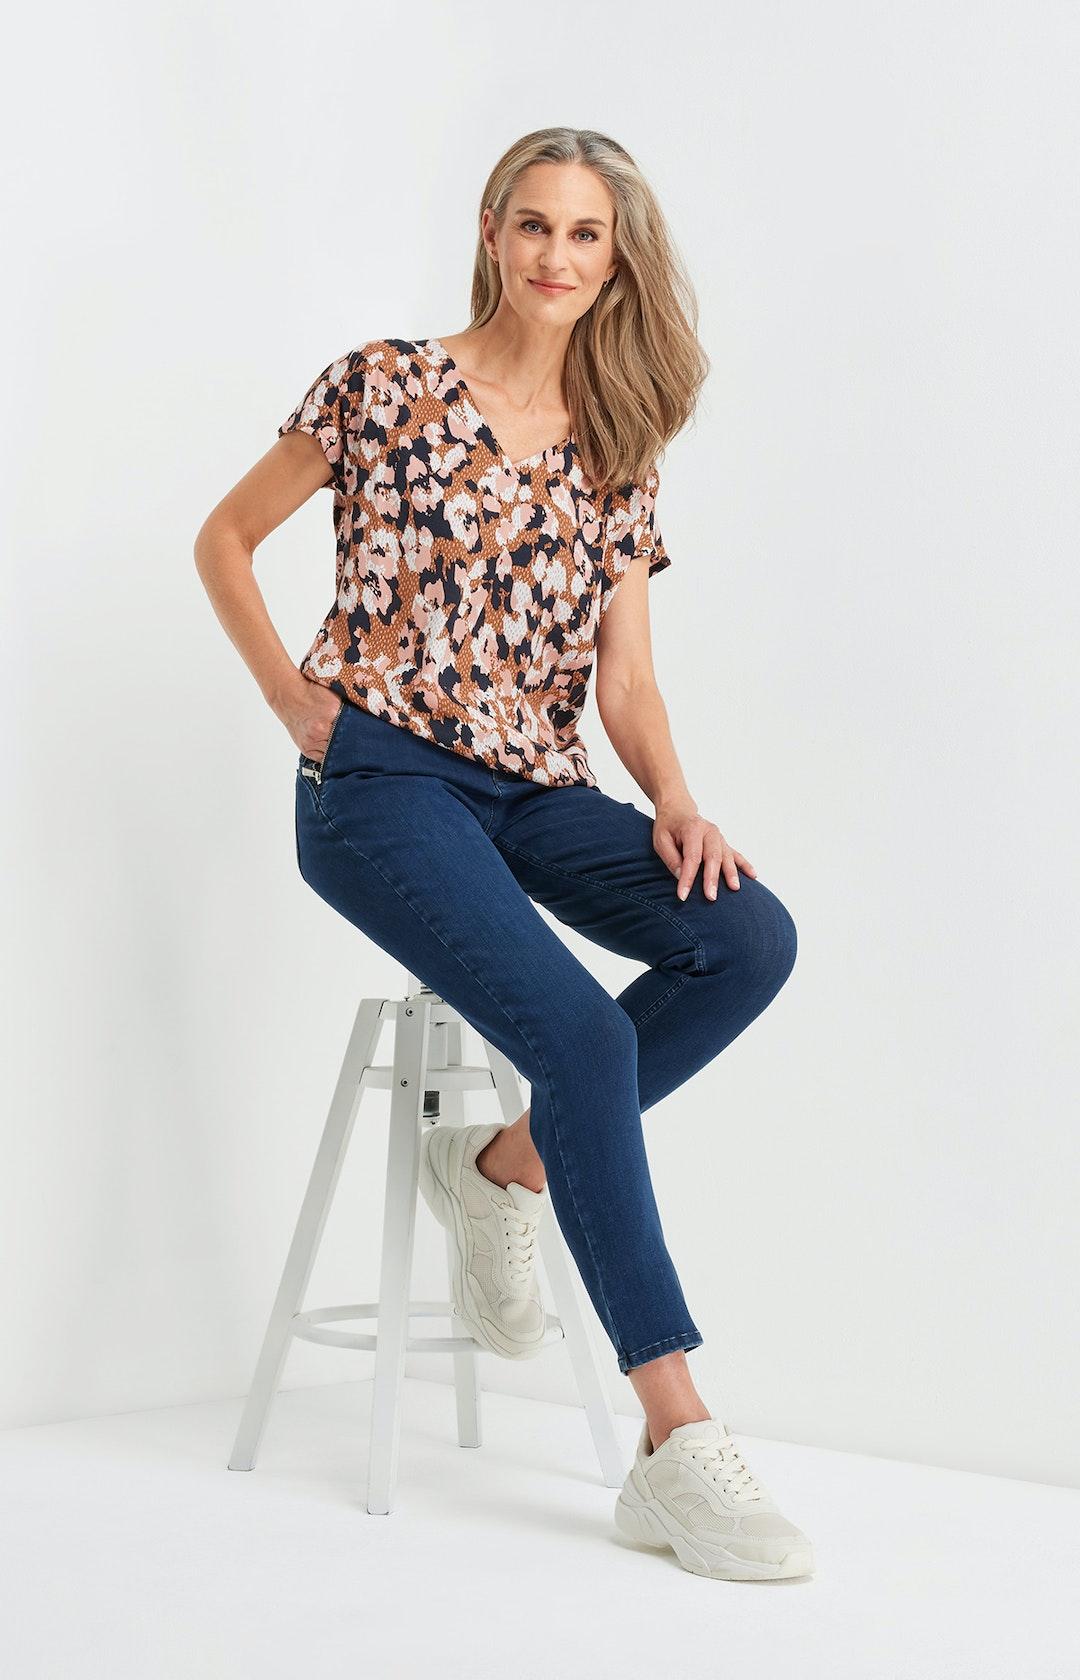 Shirtbluse mit Allover-Muster in Braun